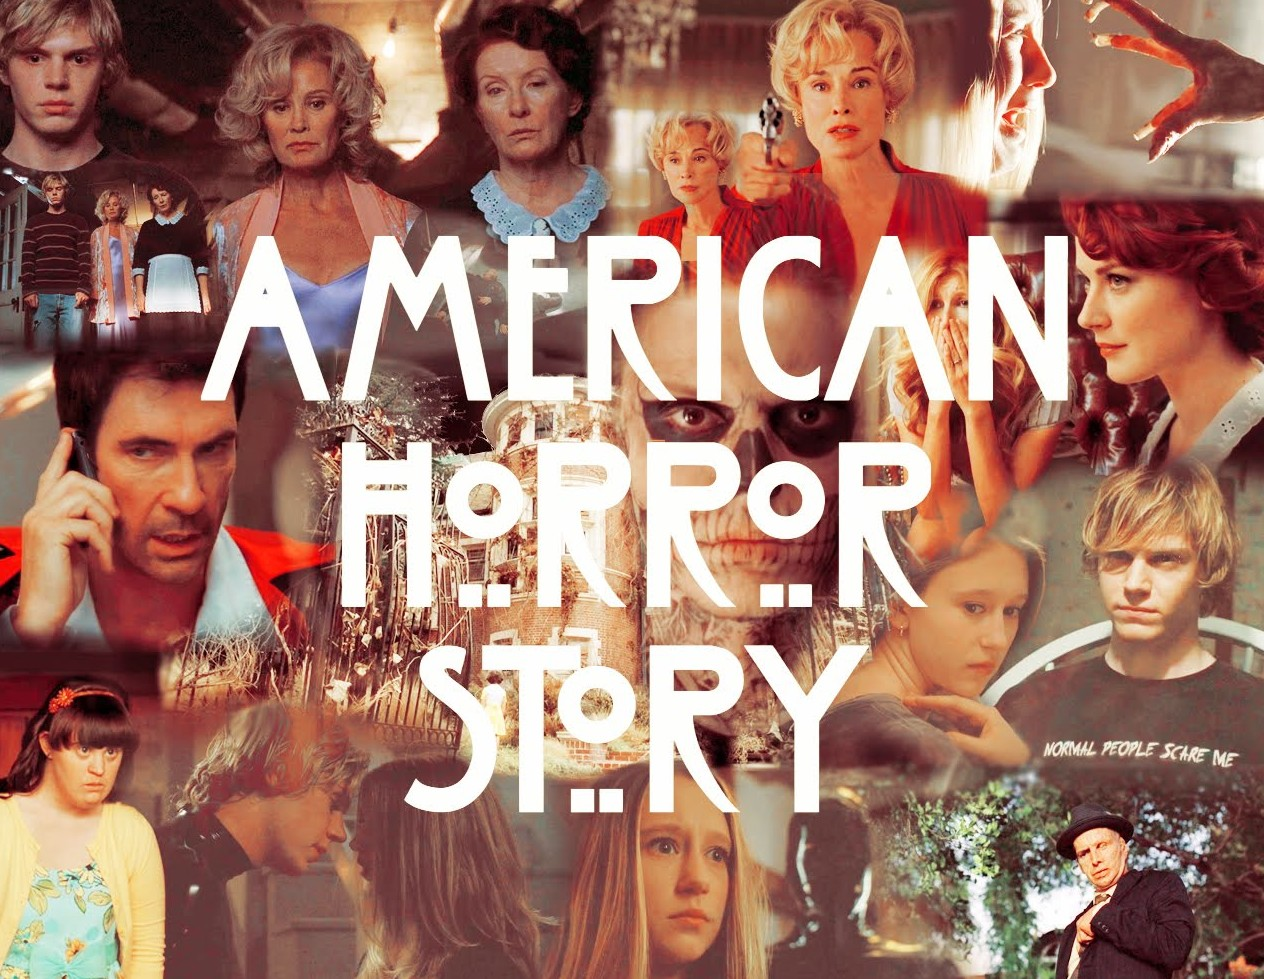 American-Horror-Story-american-horror-story-27524034-1280-1024